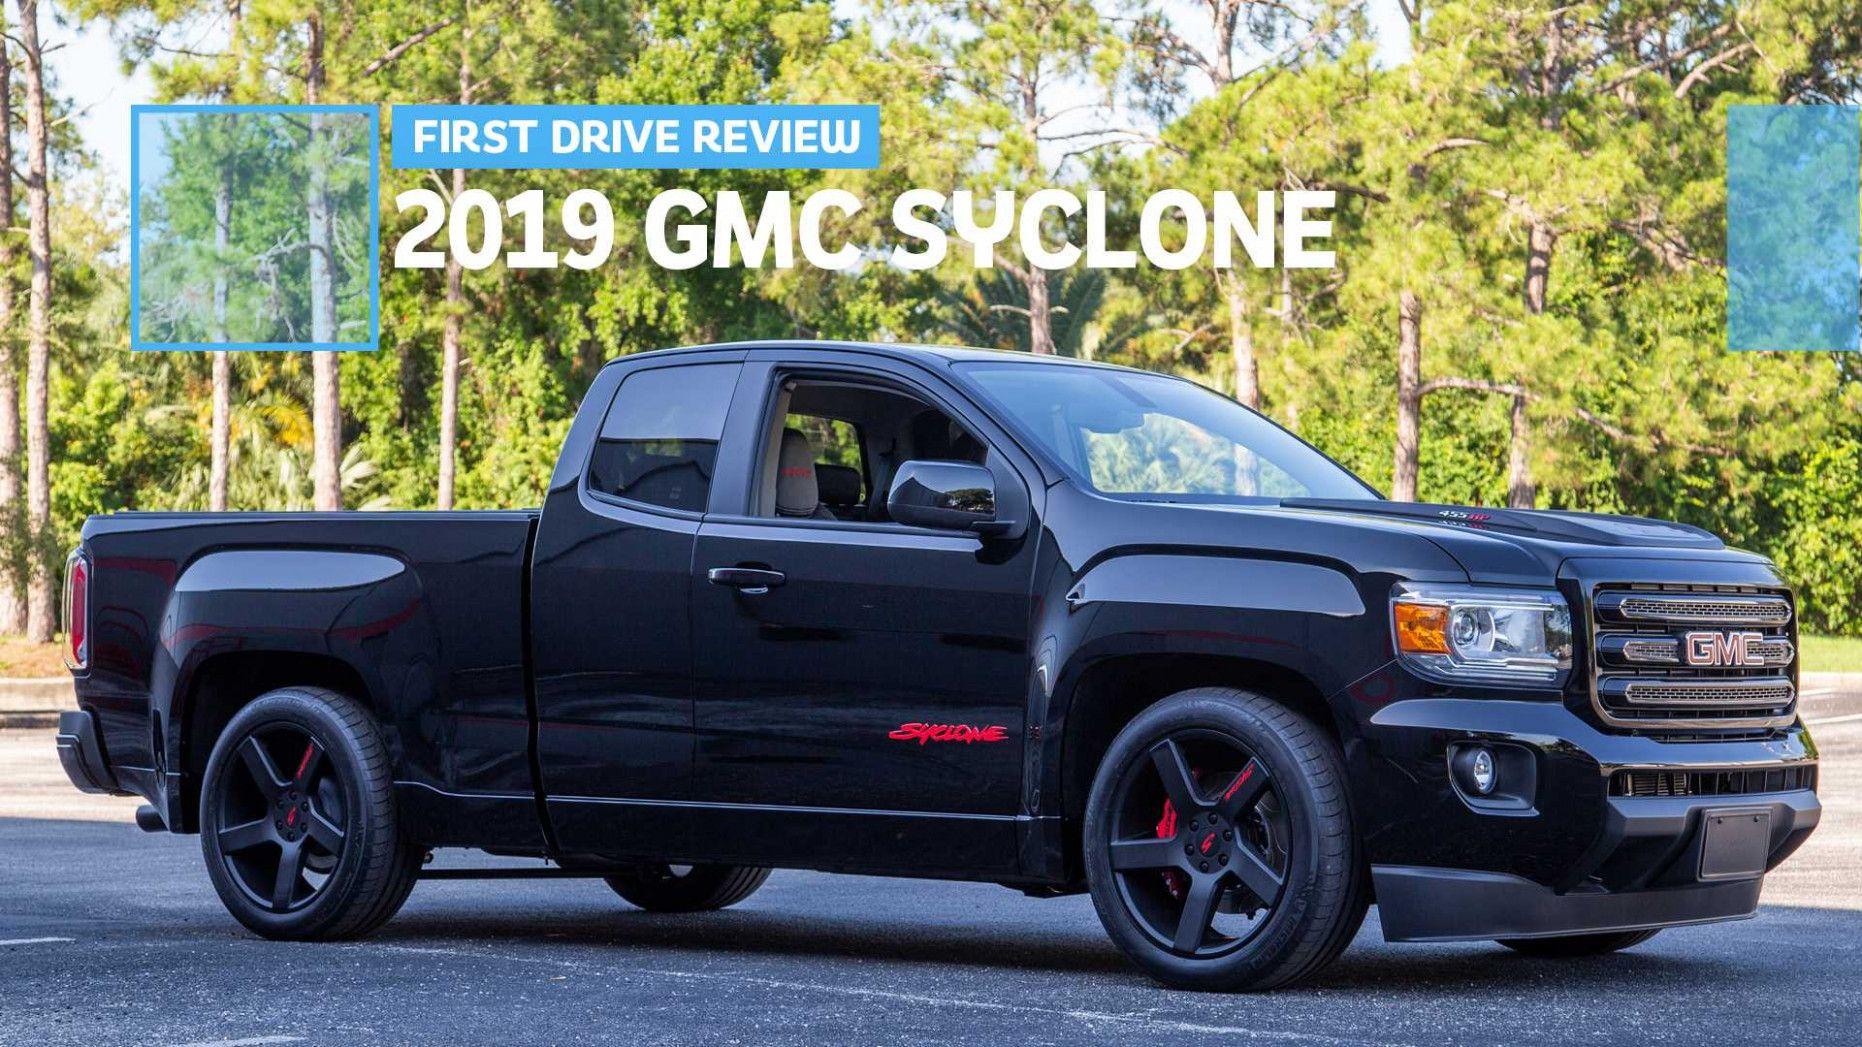 2020 Gmc Syclone History 2020 Gmc Syclone 2019 455hp Syclone2019